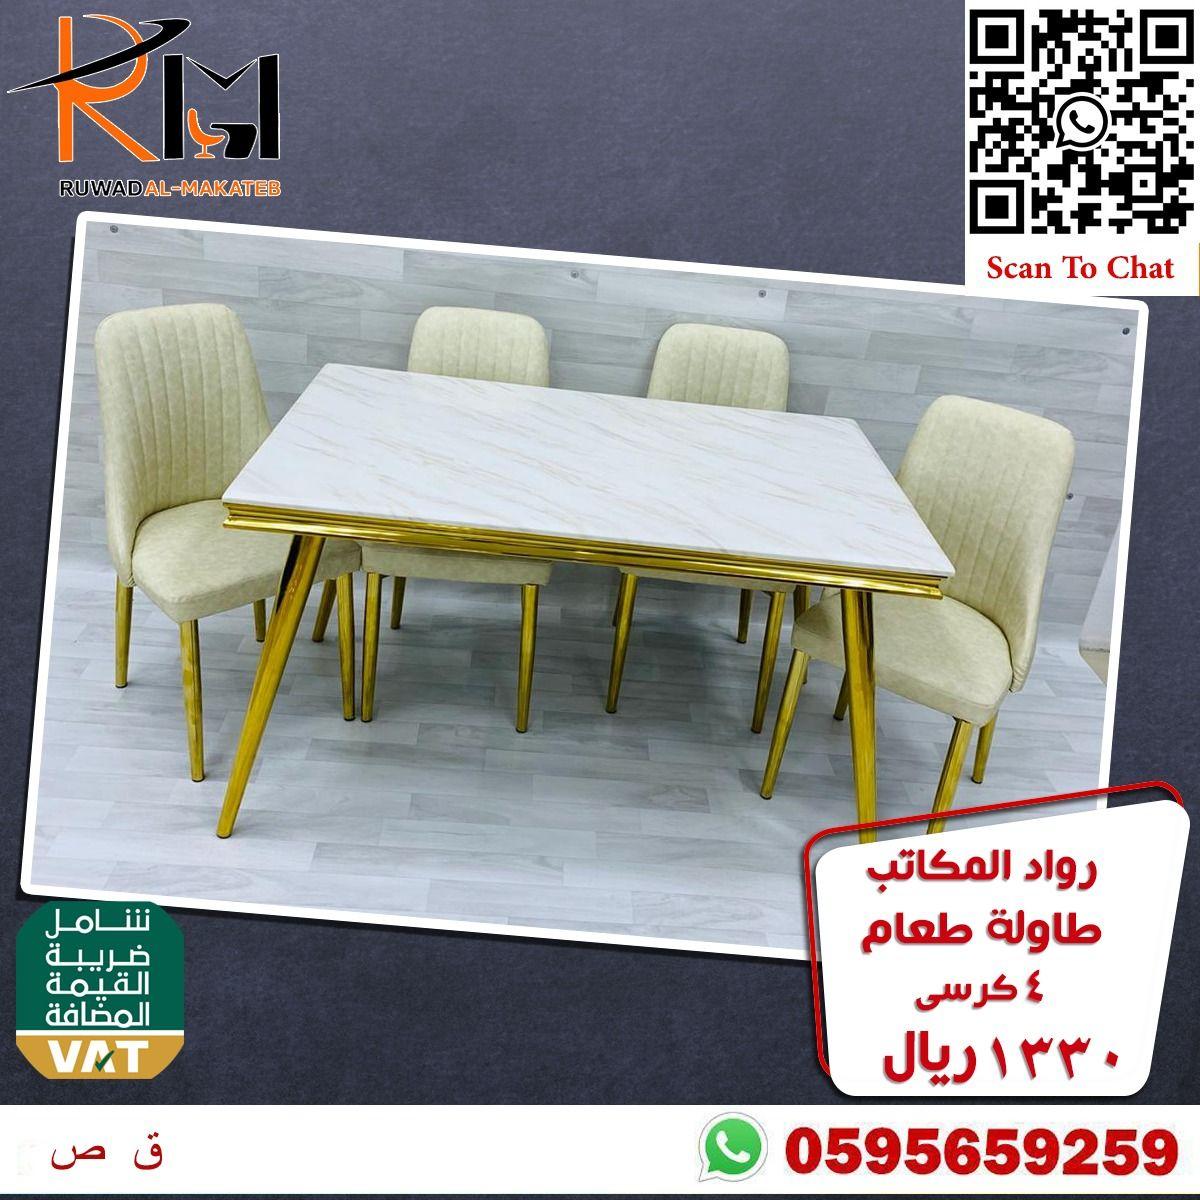 طاولة طعام ٤كرسي In 2021 Coffee Table Dining Table Table